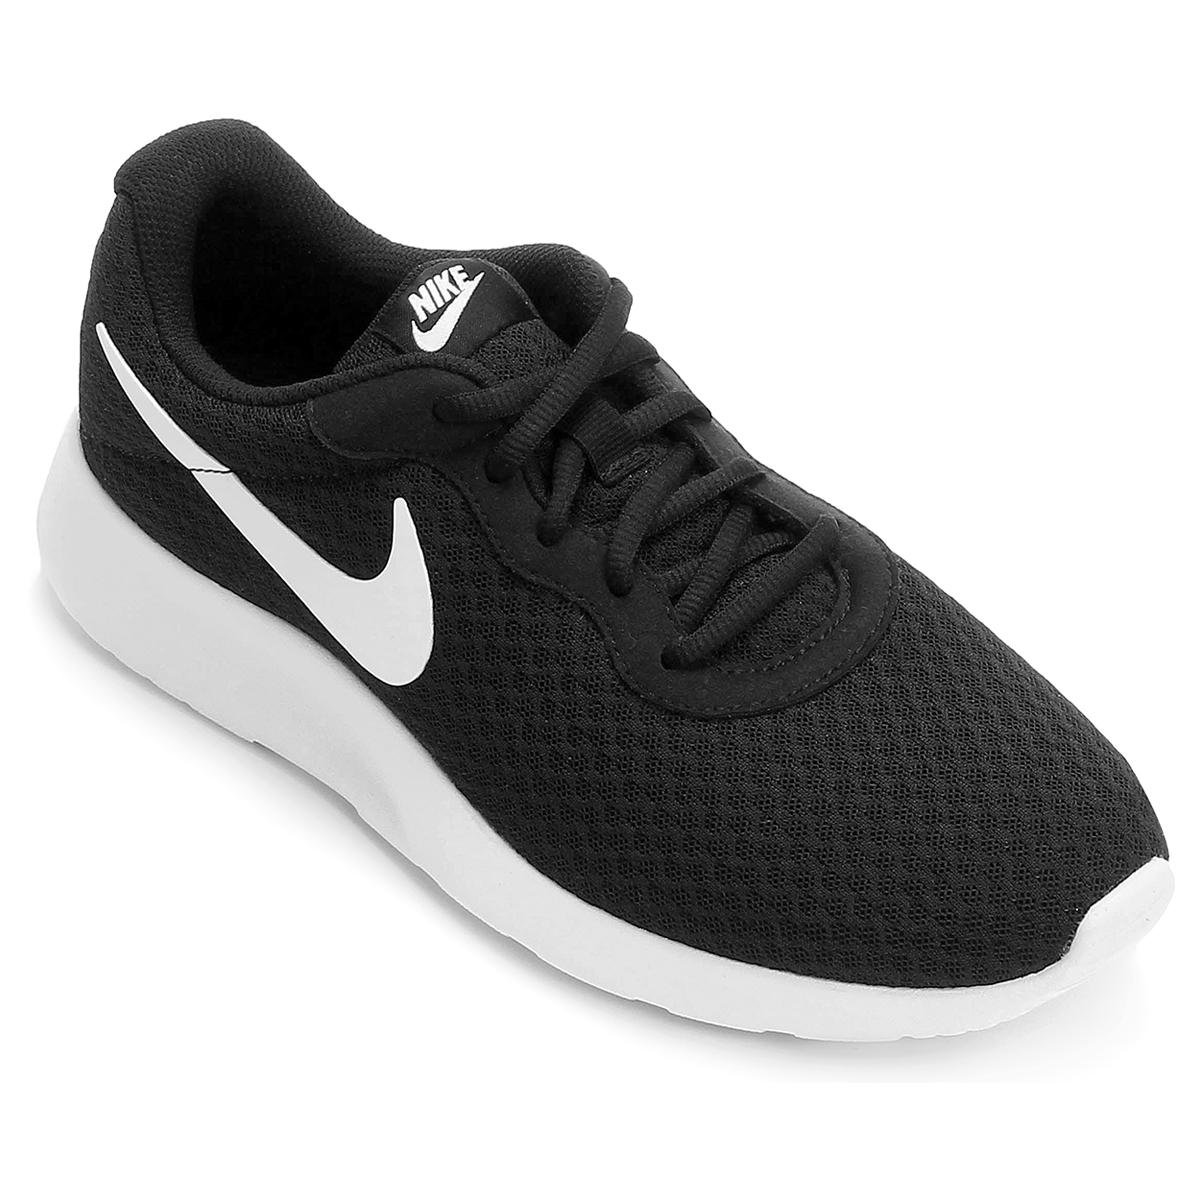 baa780ae3 Tênis Nike Tanjun Masculino - Preto e Branco - Compre Agora